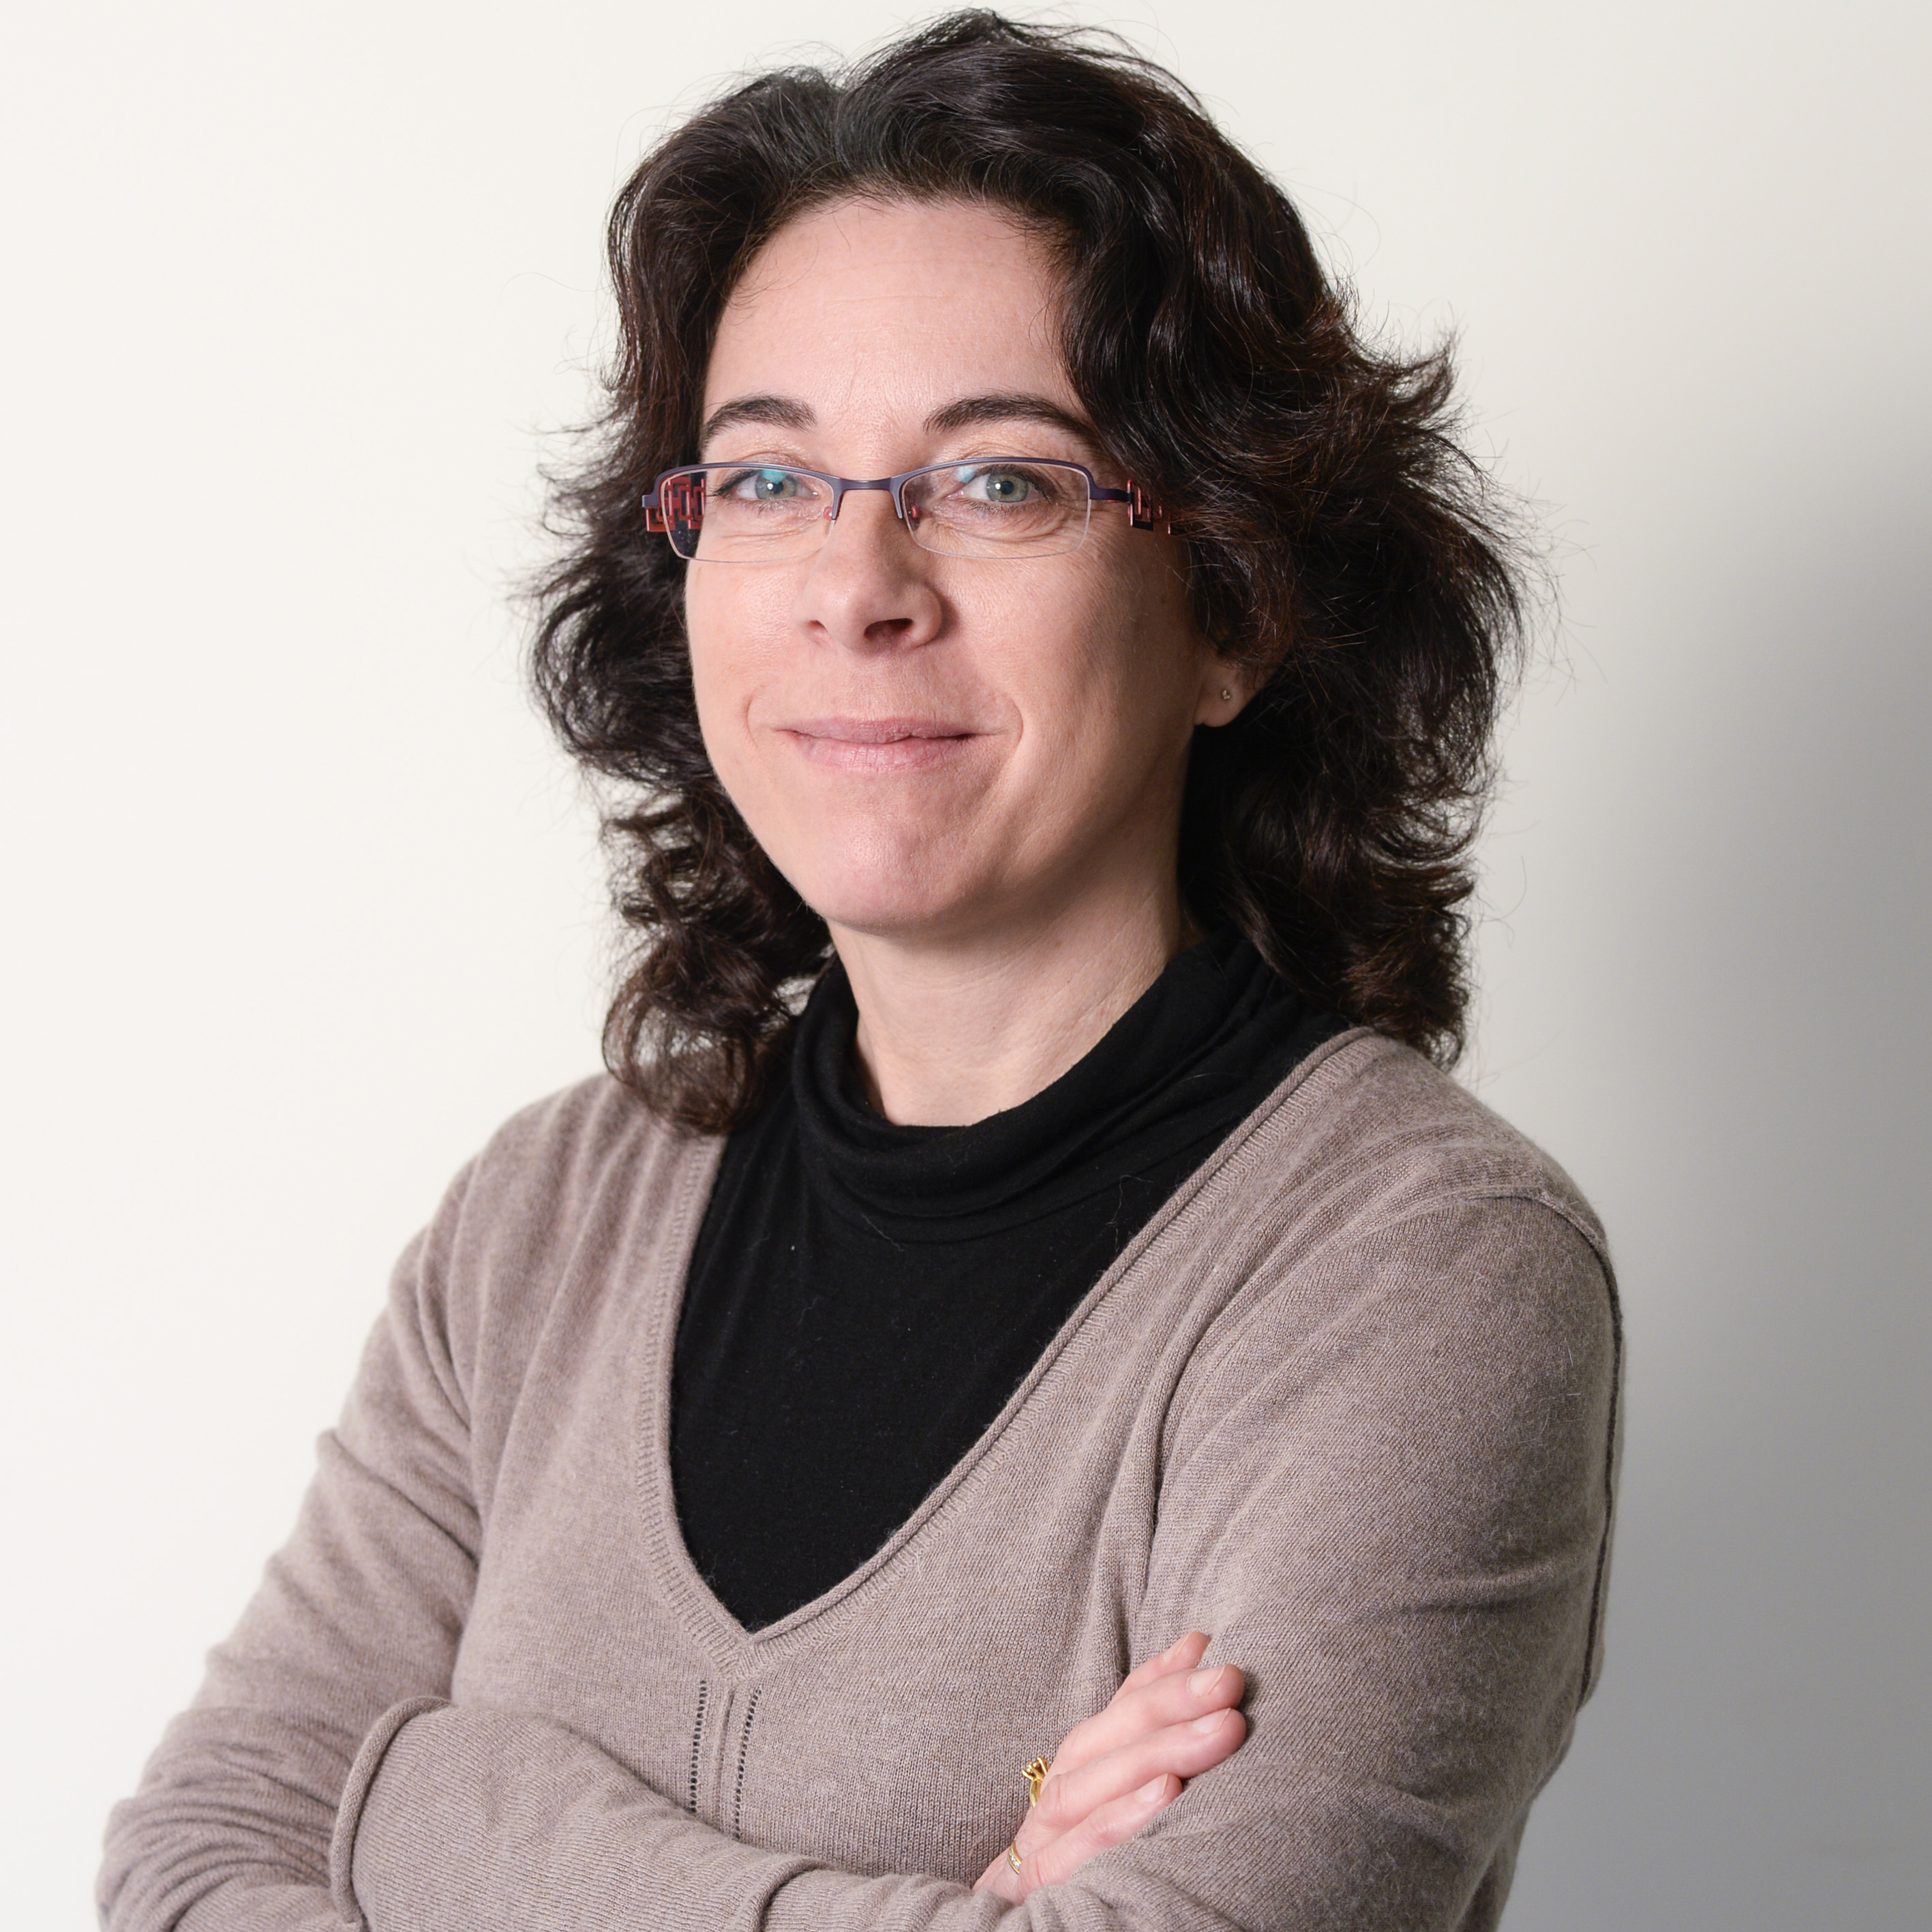 Rosène Declementi